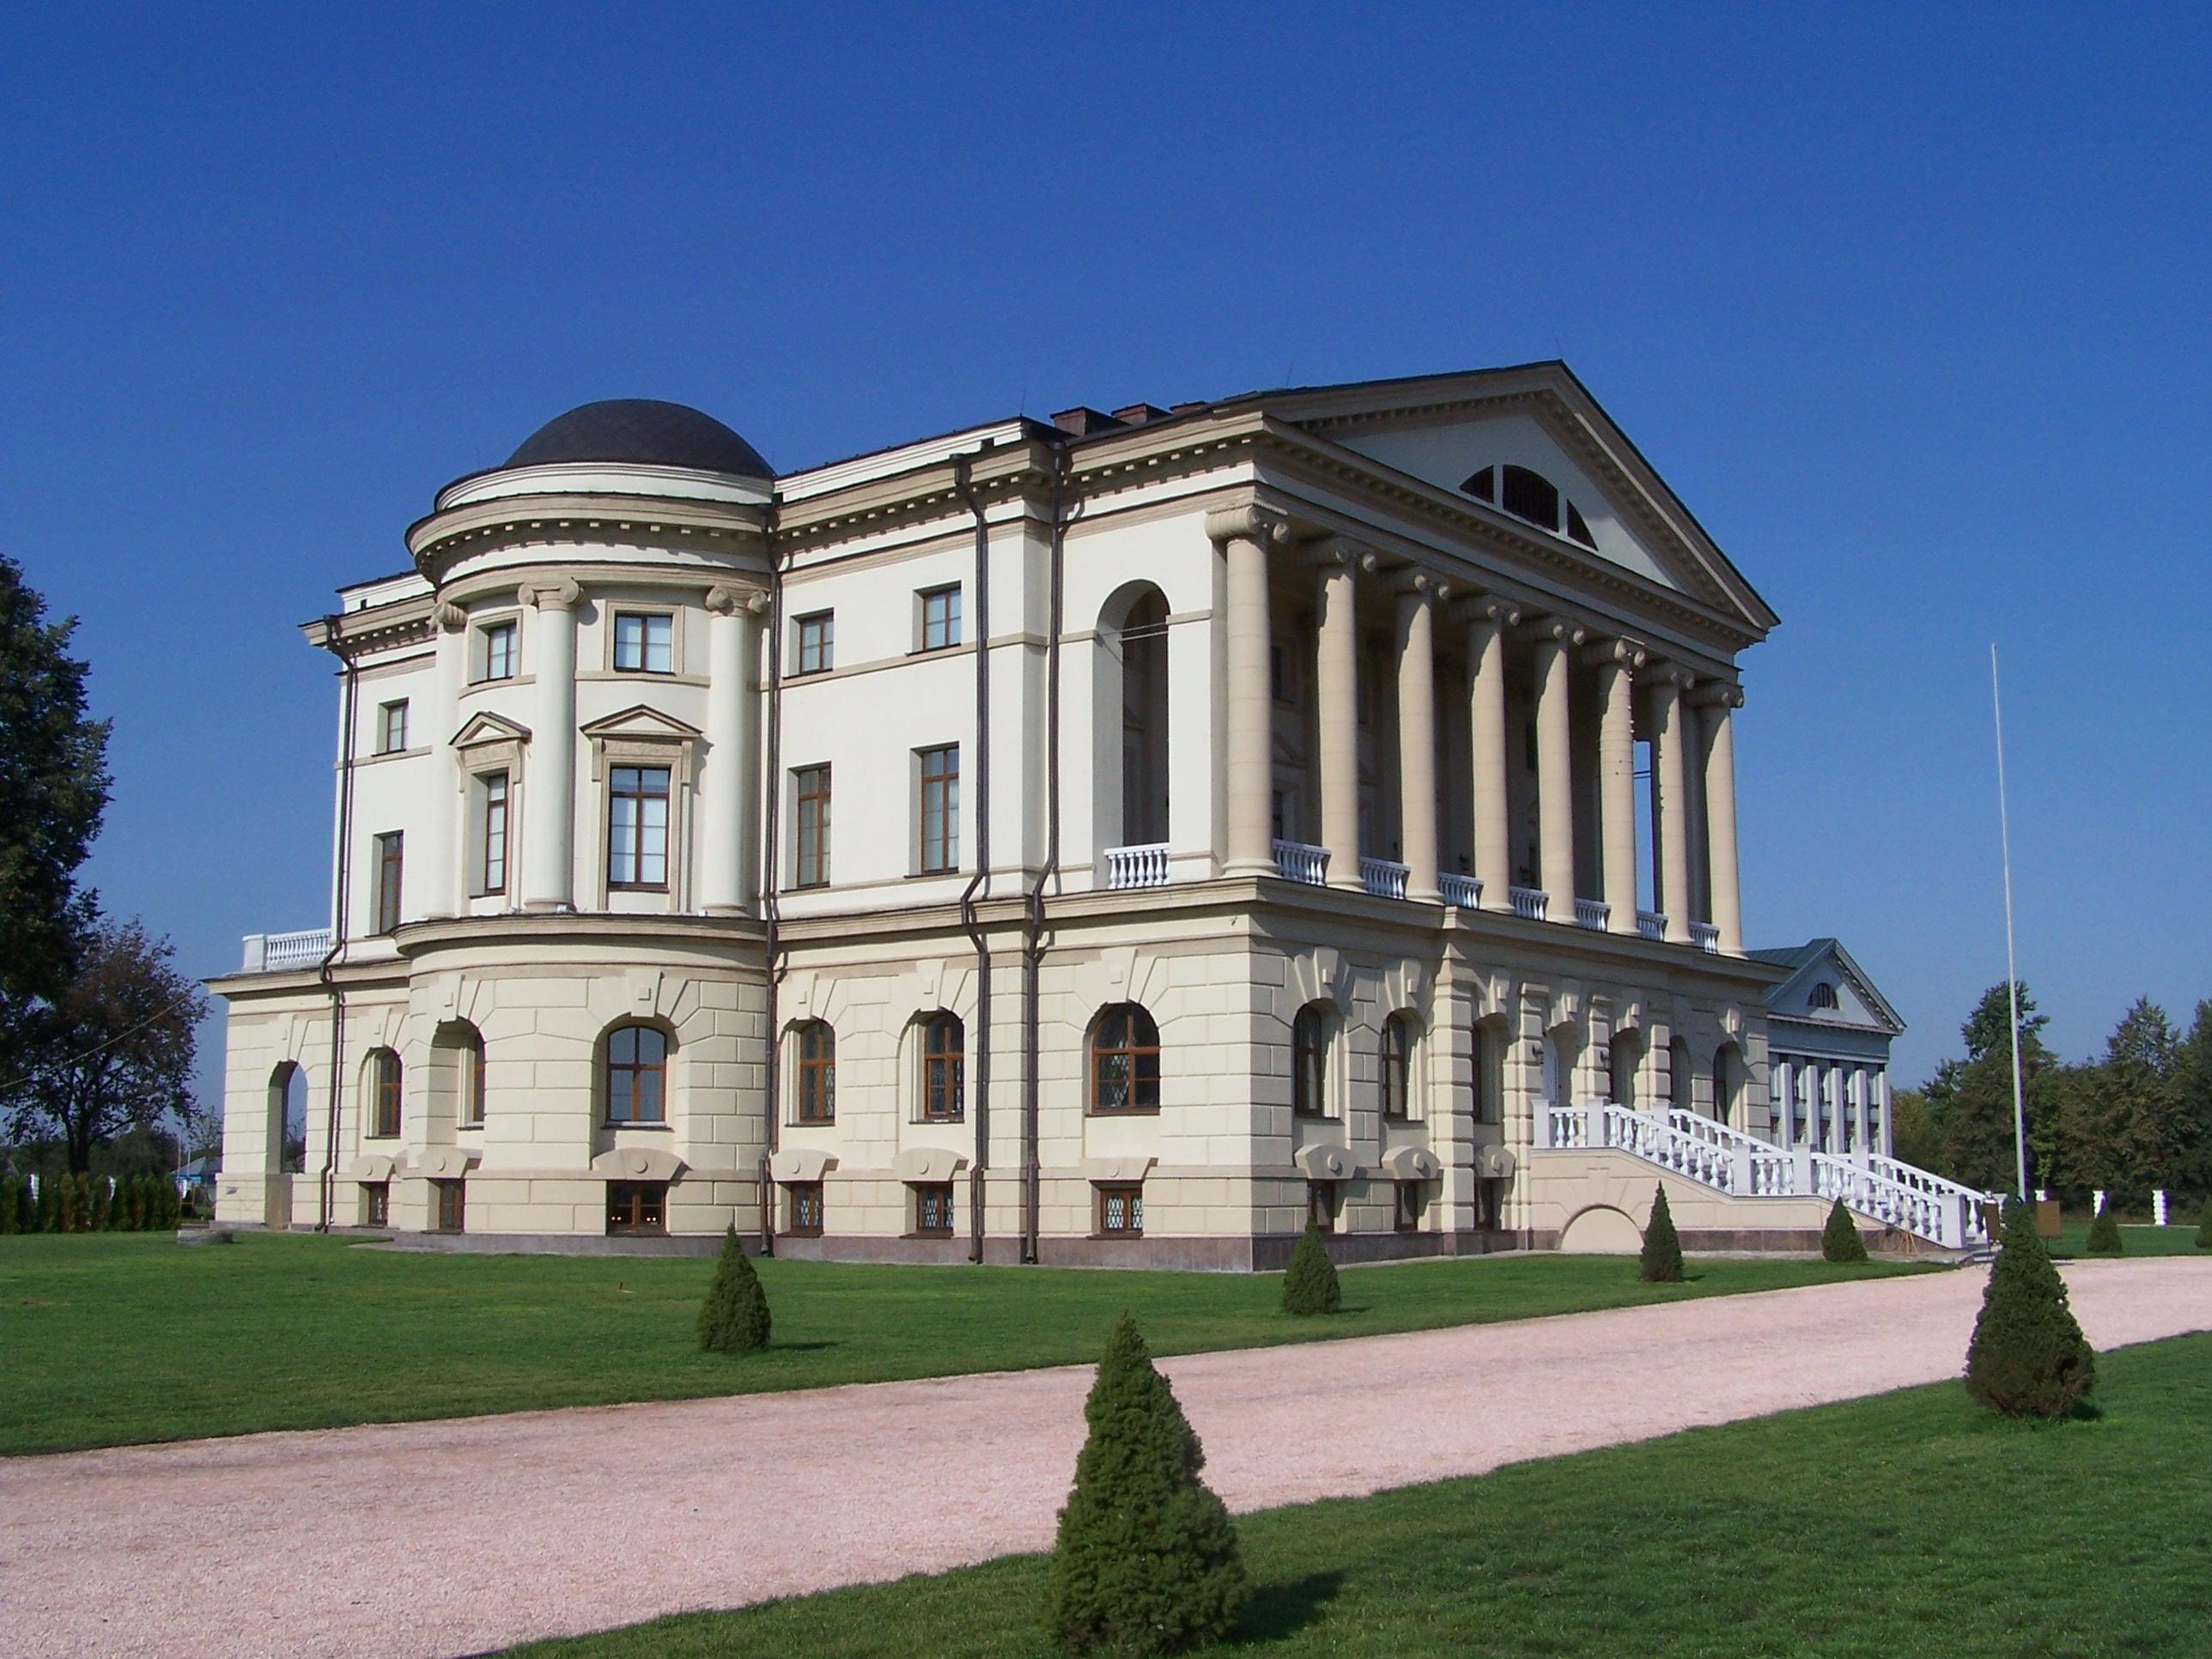 http://www.baturin-capital.gov.ua/images/stories/ggr1/r1.jpg